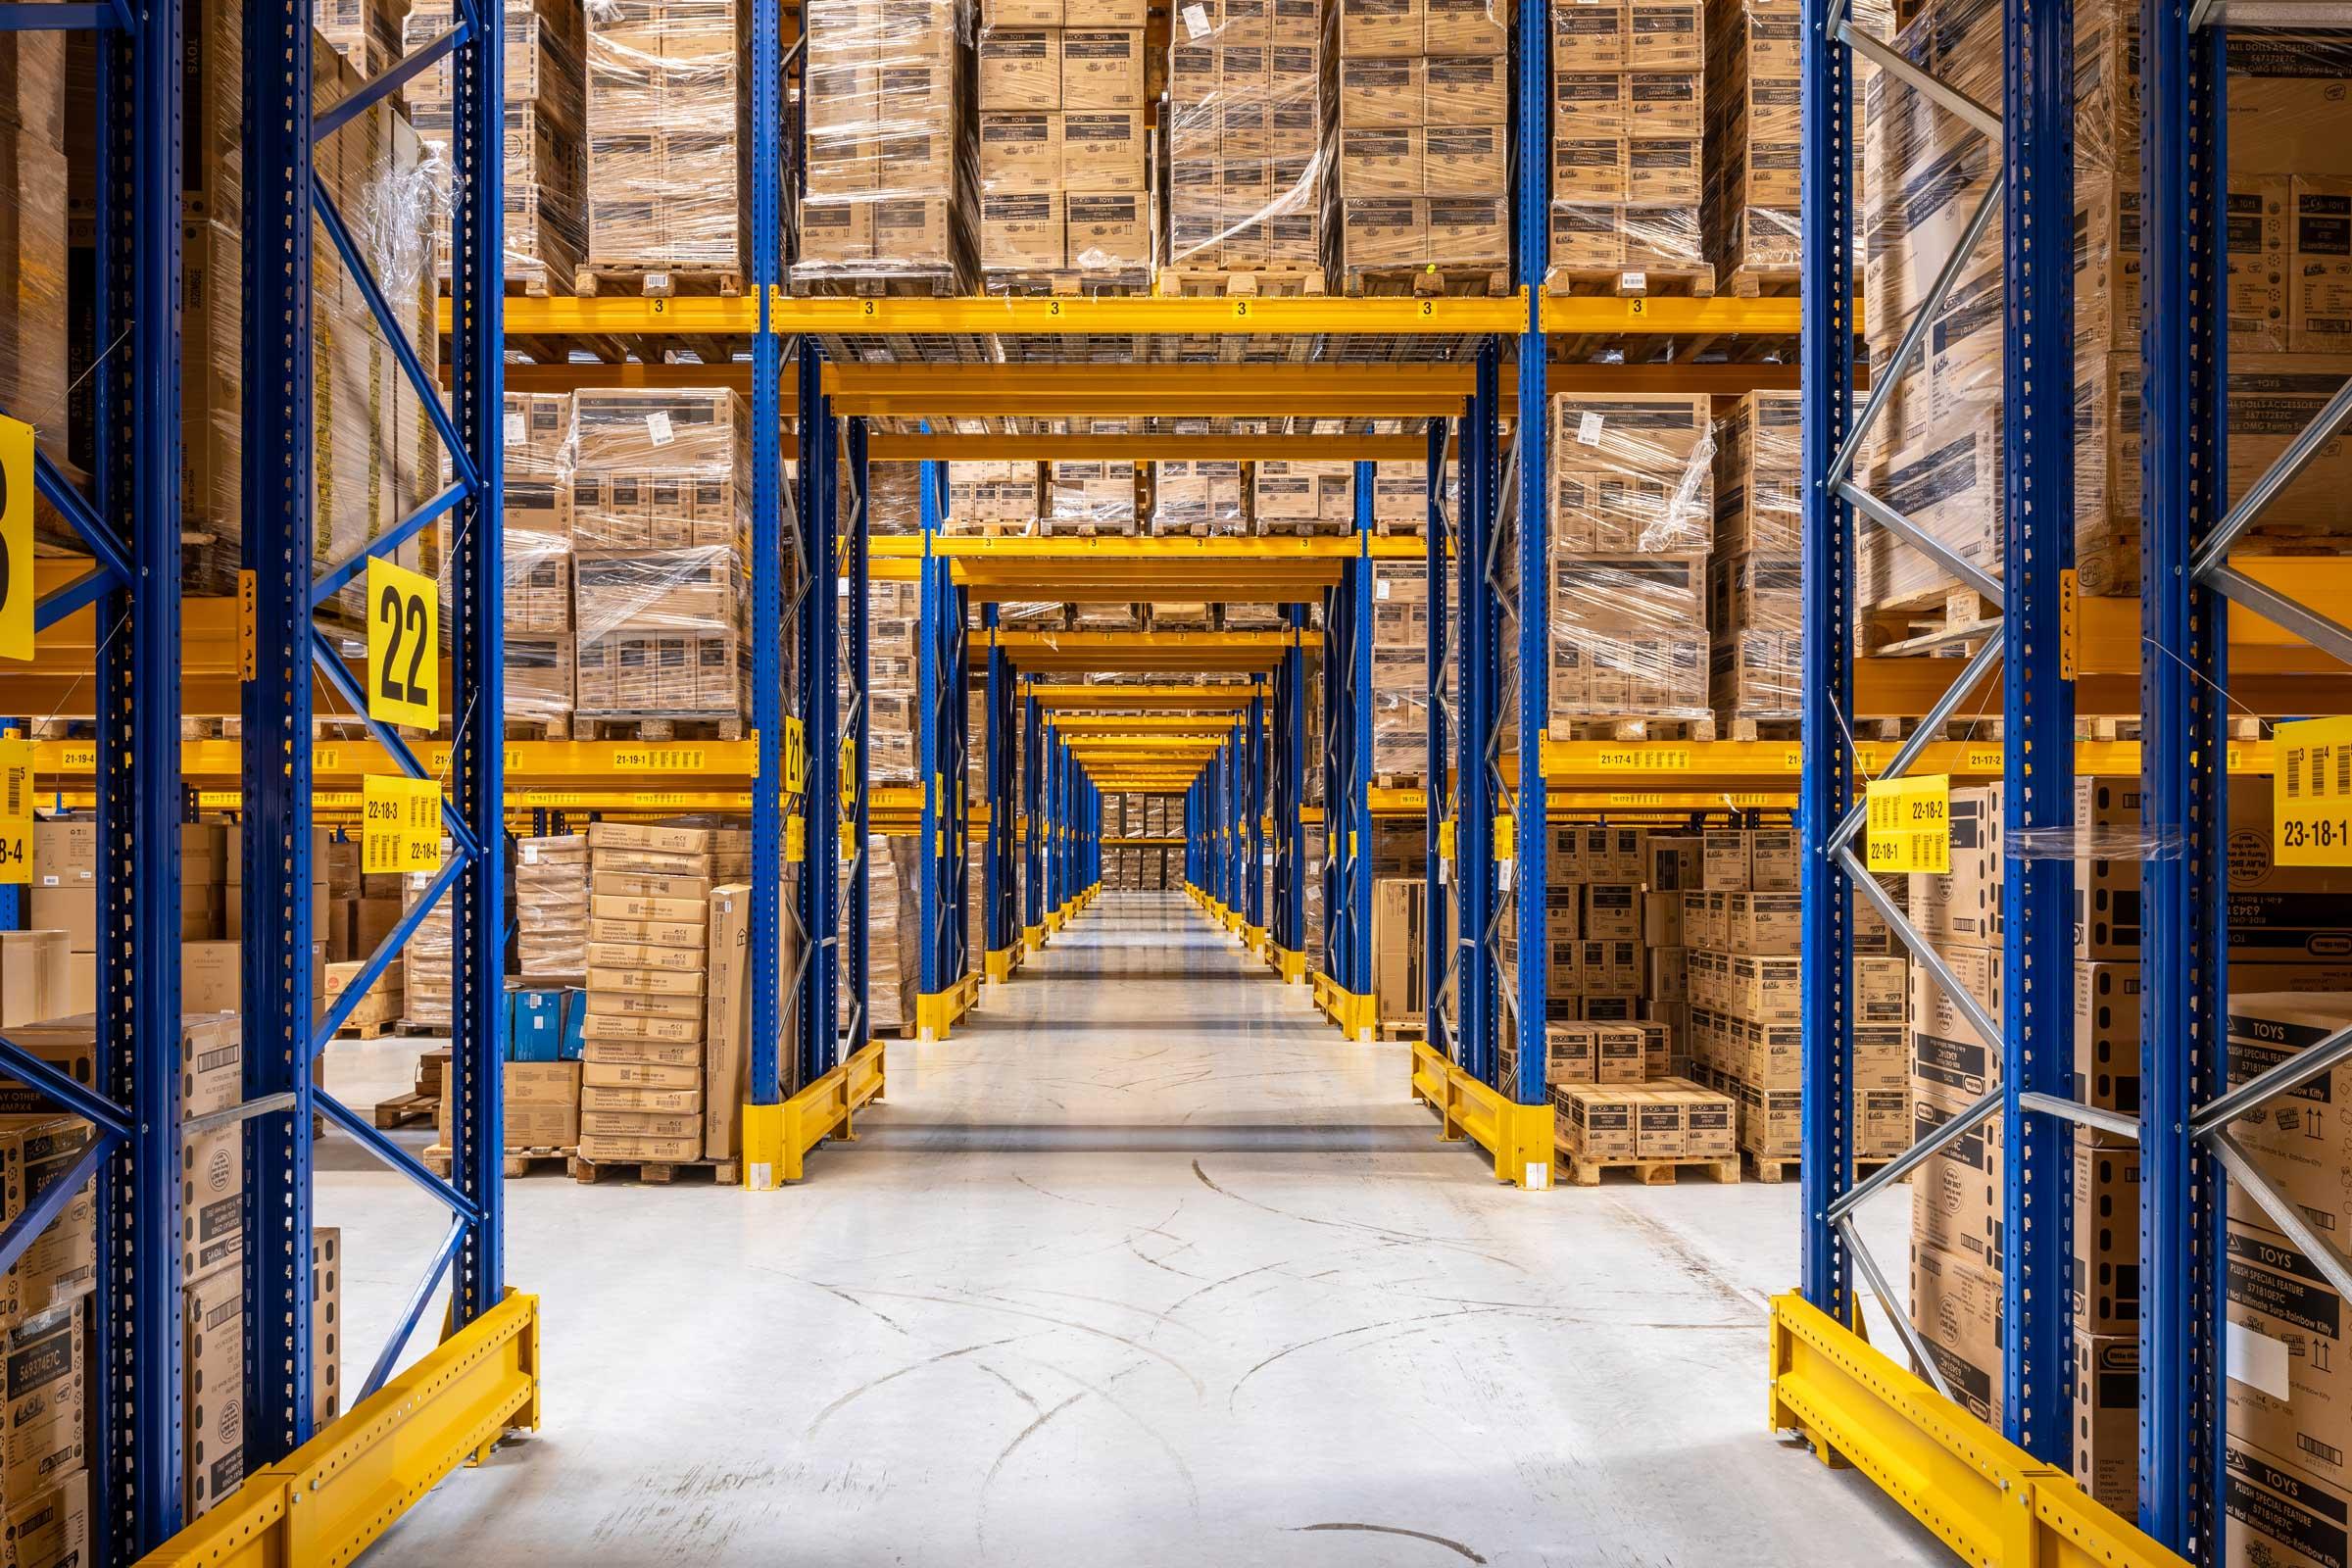 Thumbnail Medewerk(st)er warehouse crossdock (middag/avonddienst)